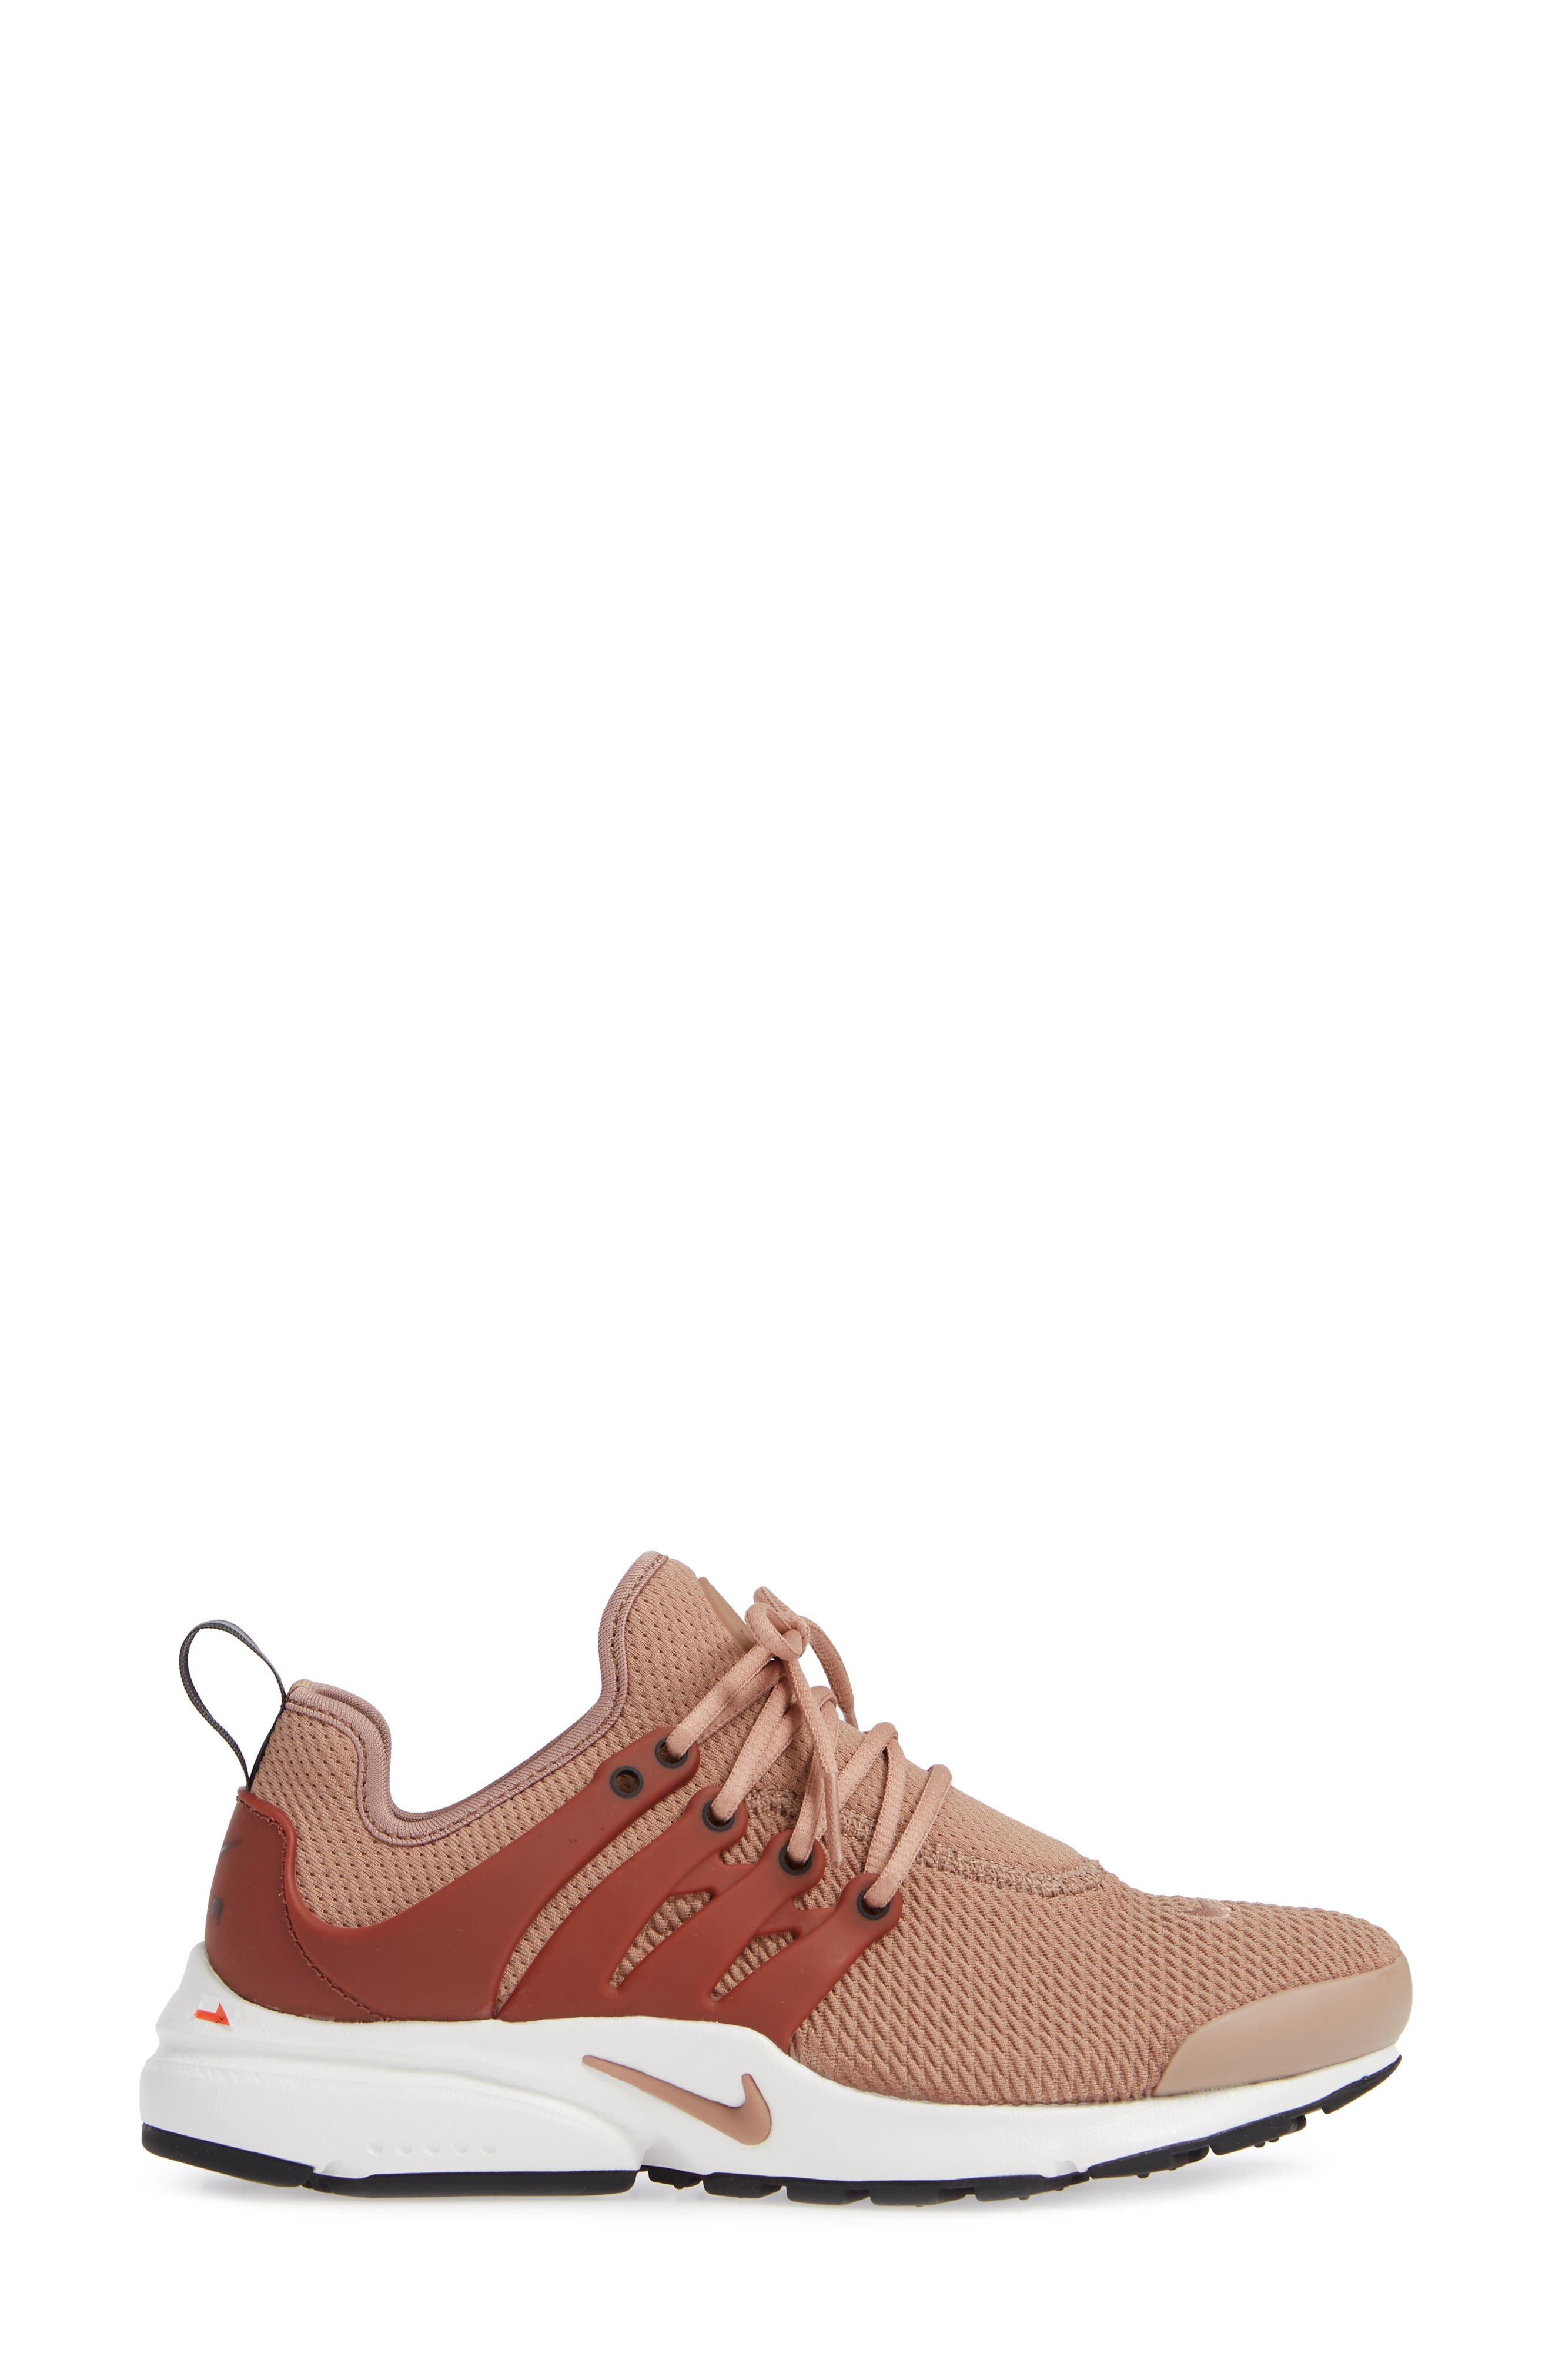 Air Presto Sneaker,                             Alternate thumbnail 3, color,                             251